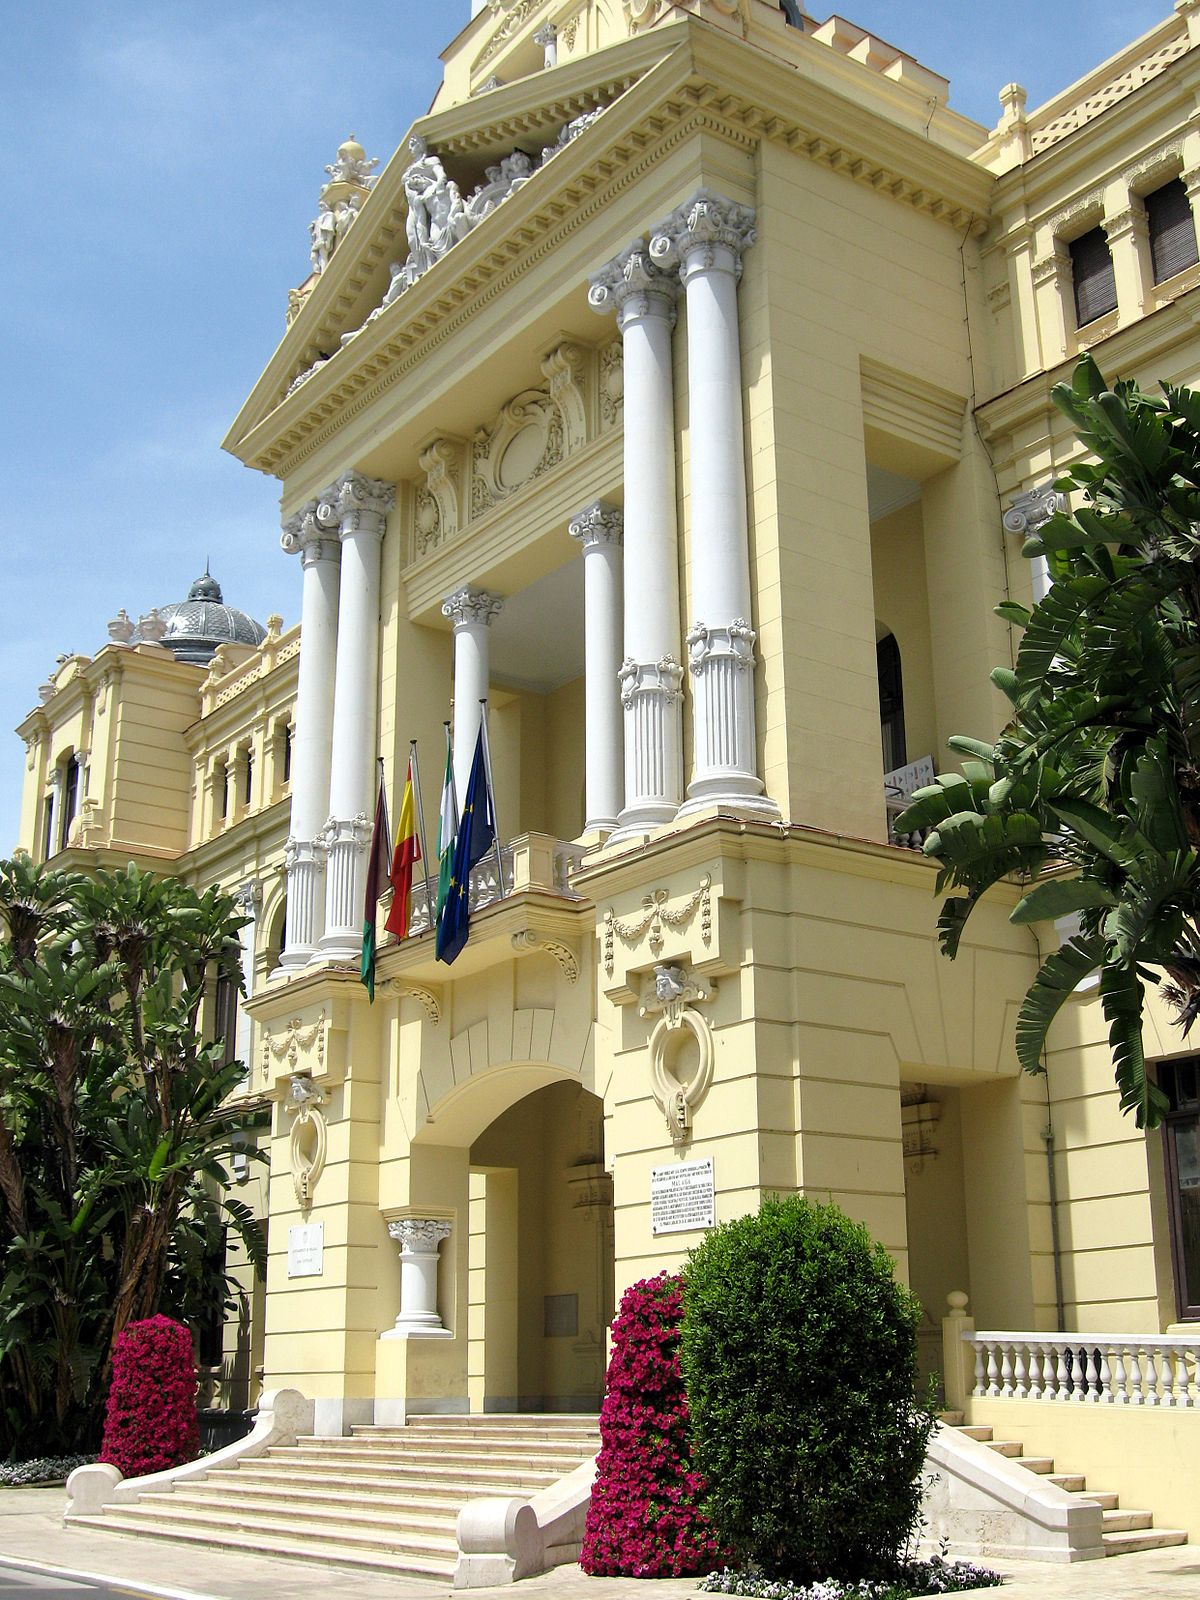 Casa consistorial de m laga wikipedia la enciclopedia libre - La casa del parque ...